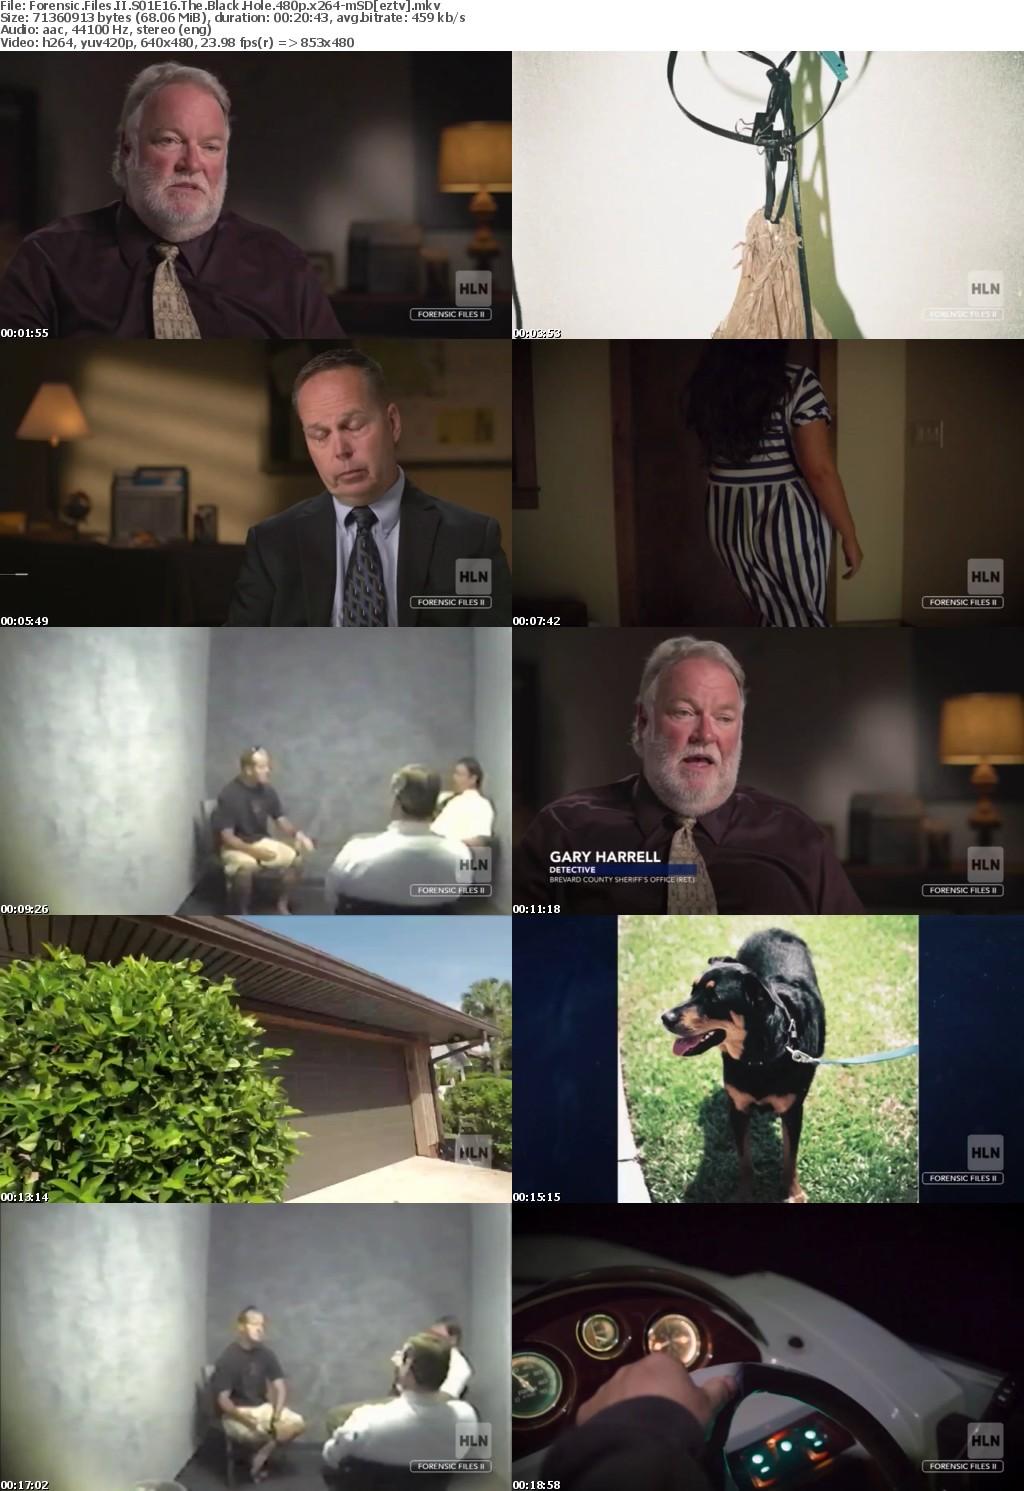 Forensic Files II S01E16 The Black Hole 480p x264-mSD